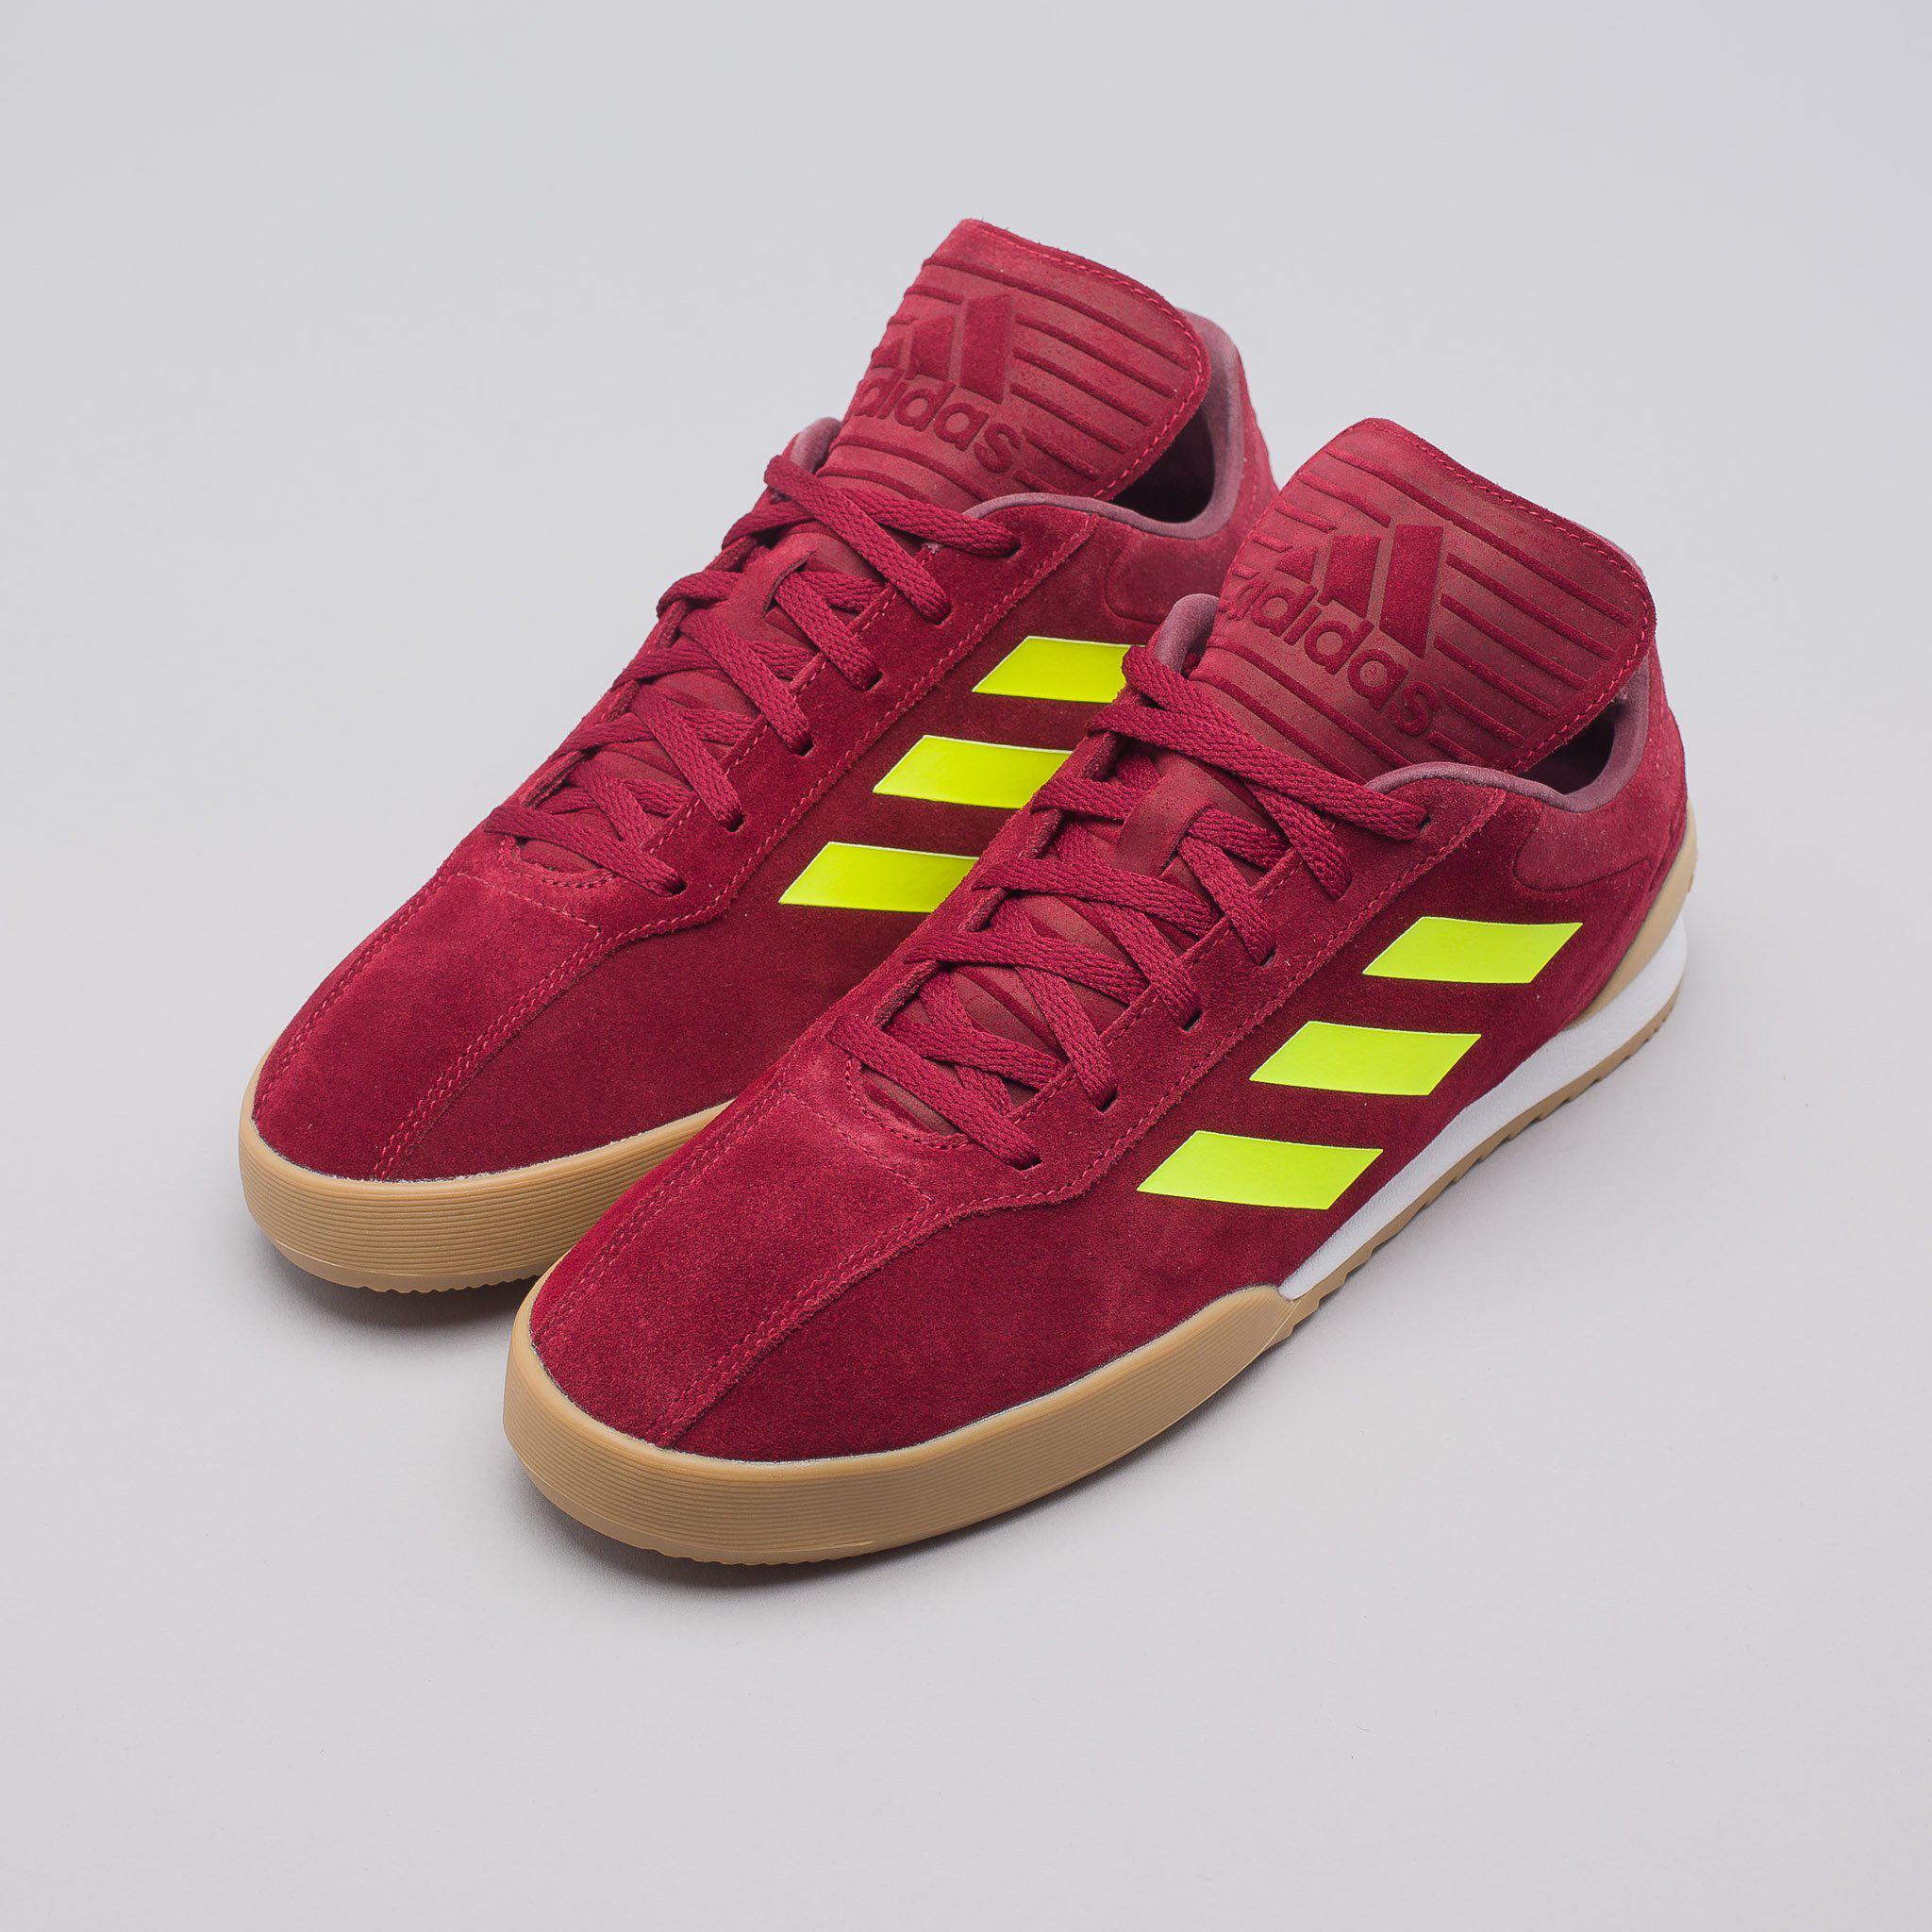 new arrival 7dd93 8ea54 Lyst - Gosha Rubchinskiy Copa Super Suede Sneakers for Men